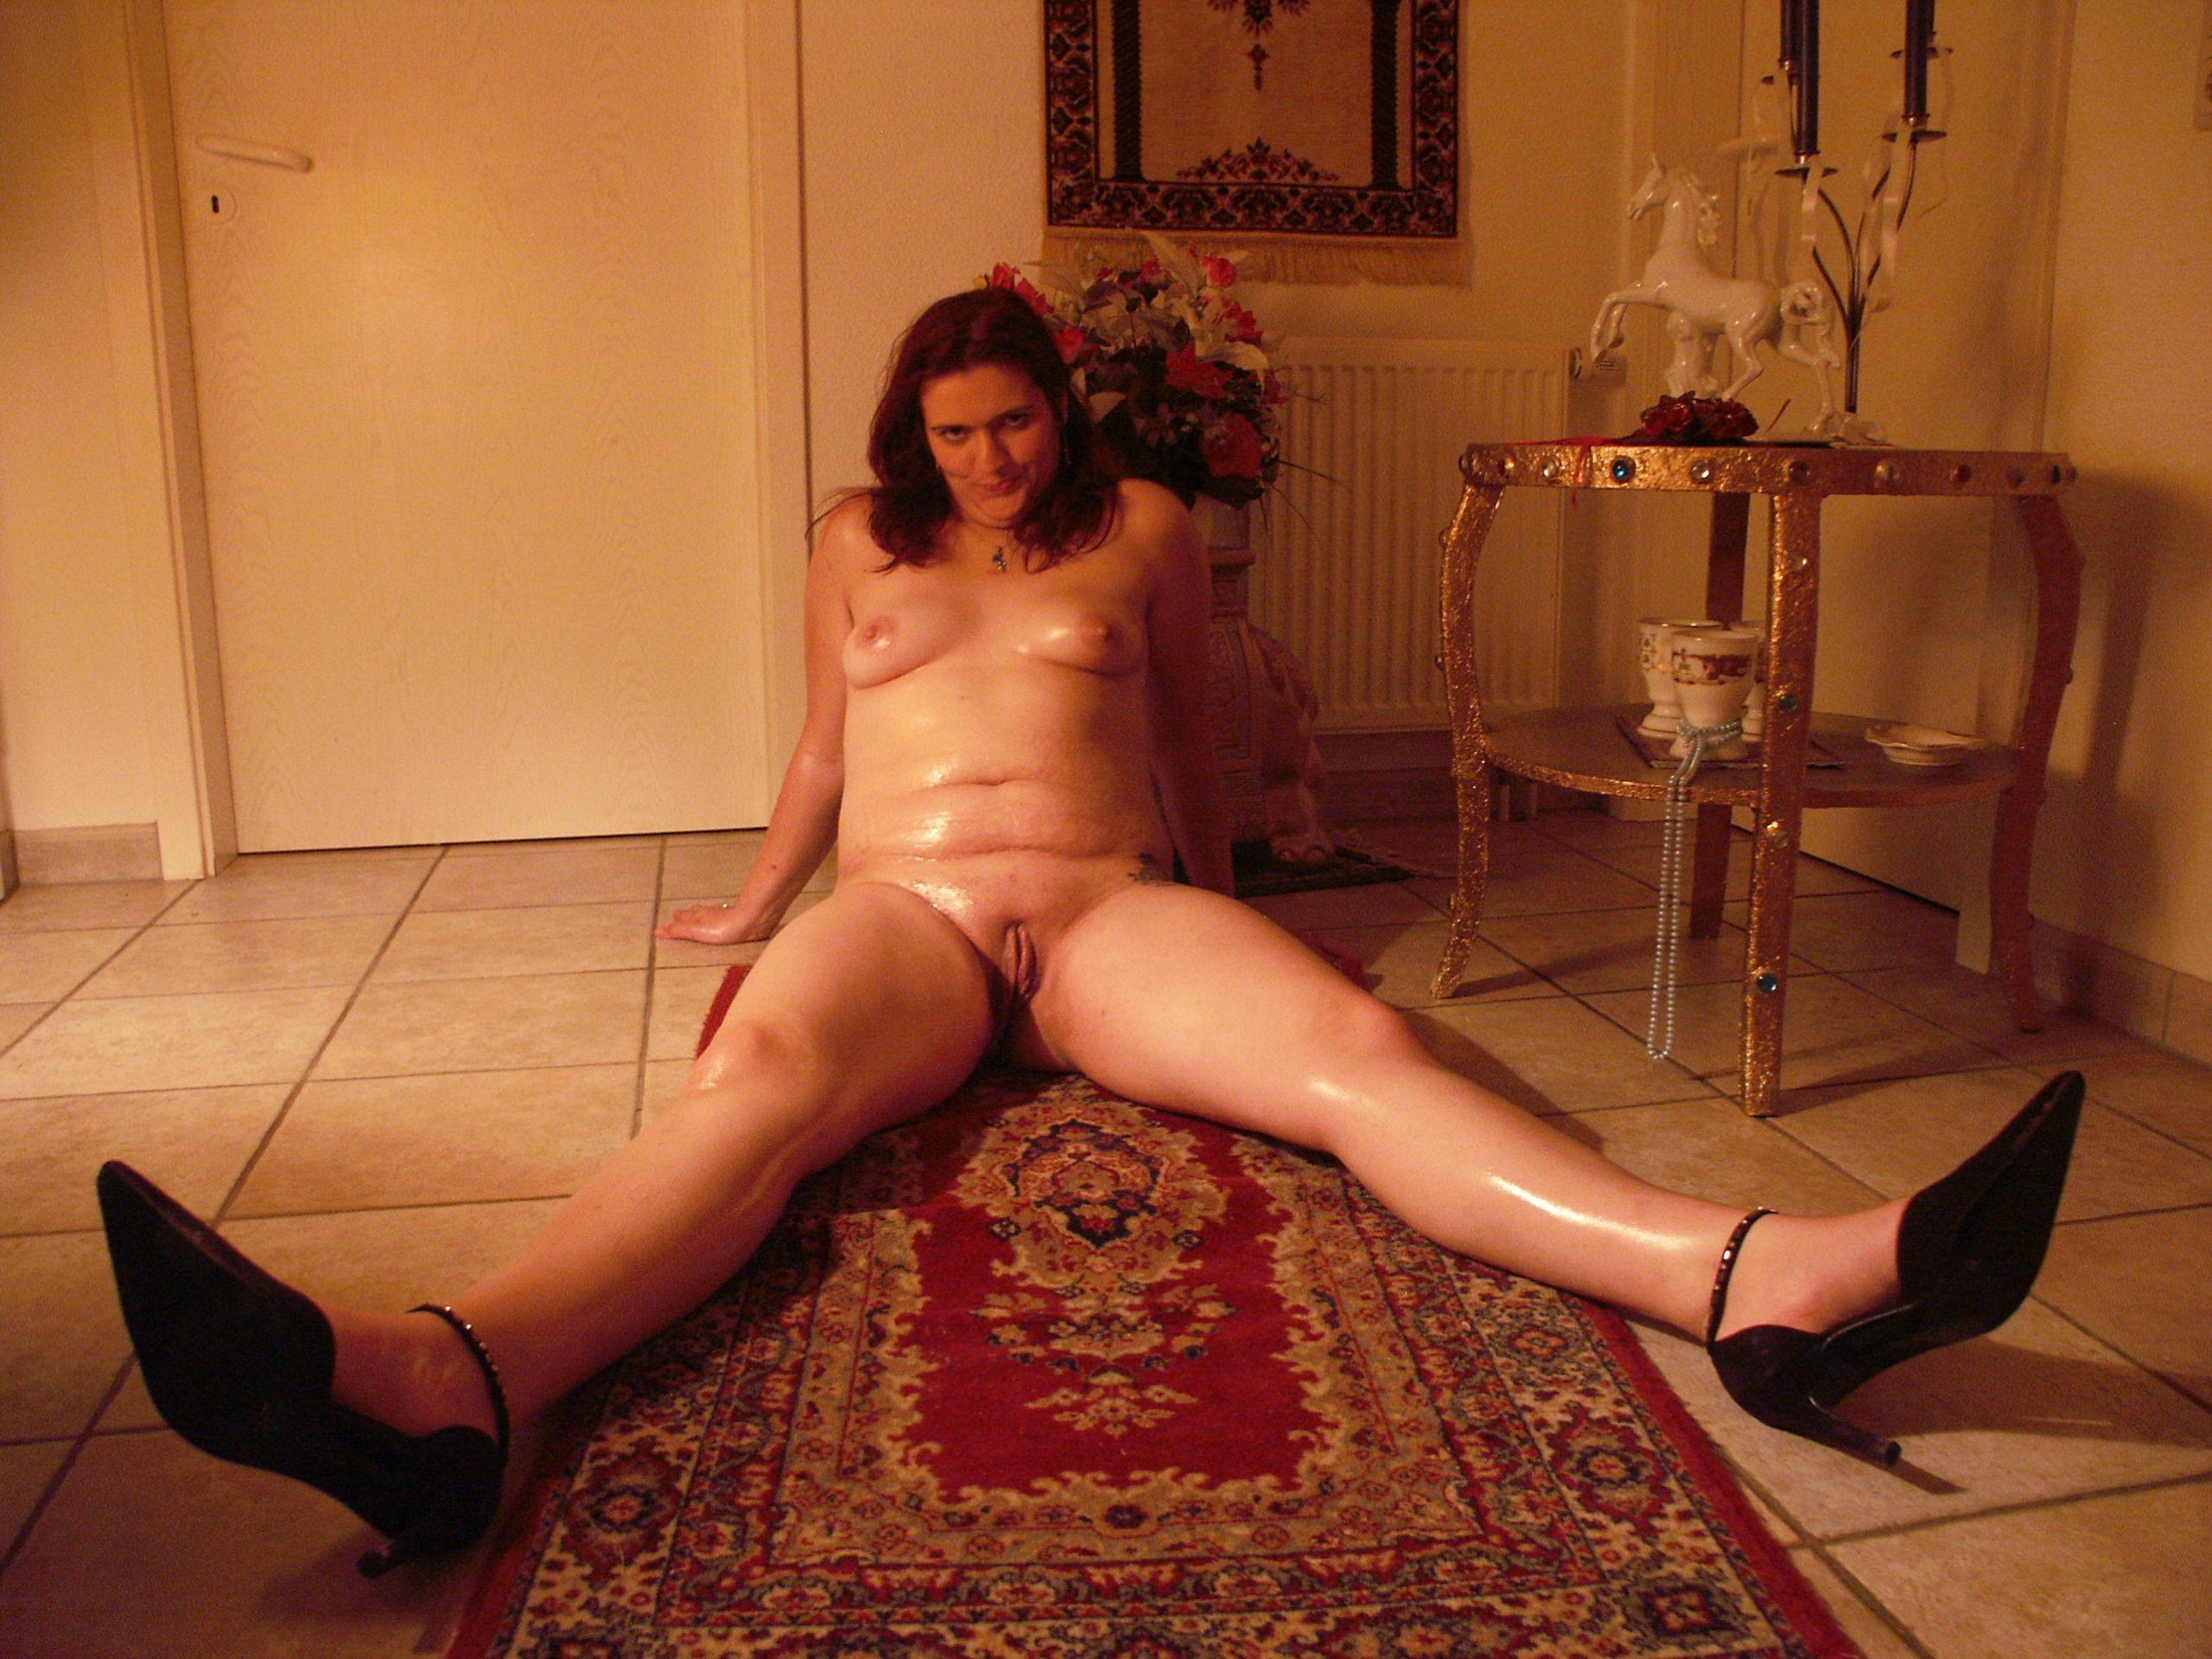 private Sexkontakte Detmold